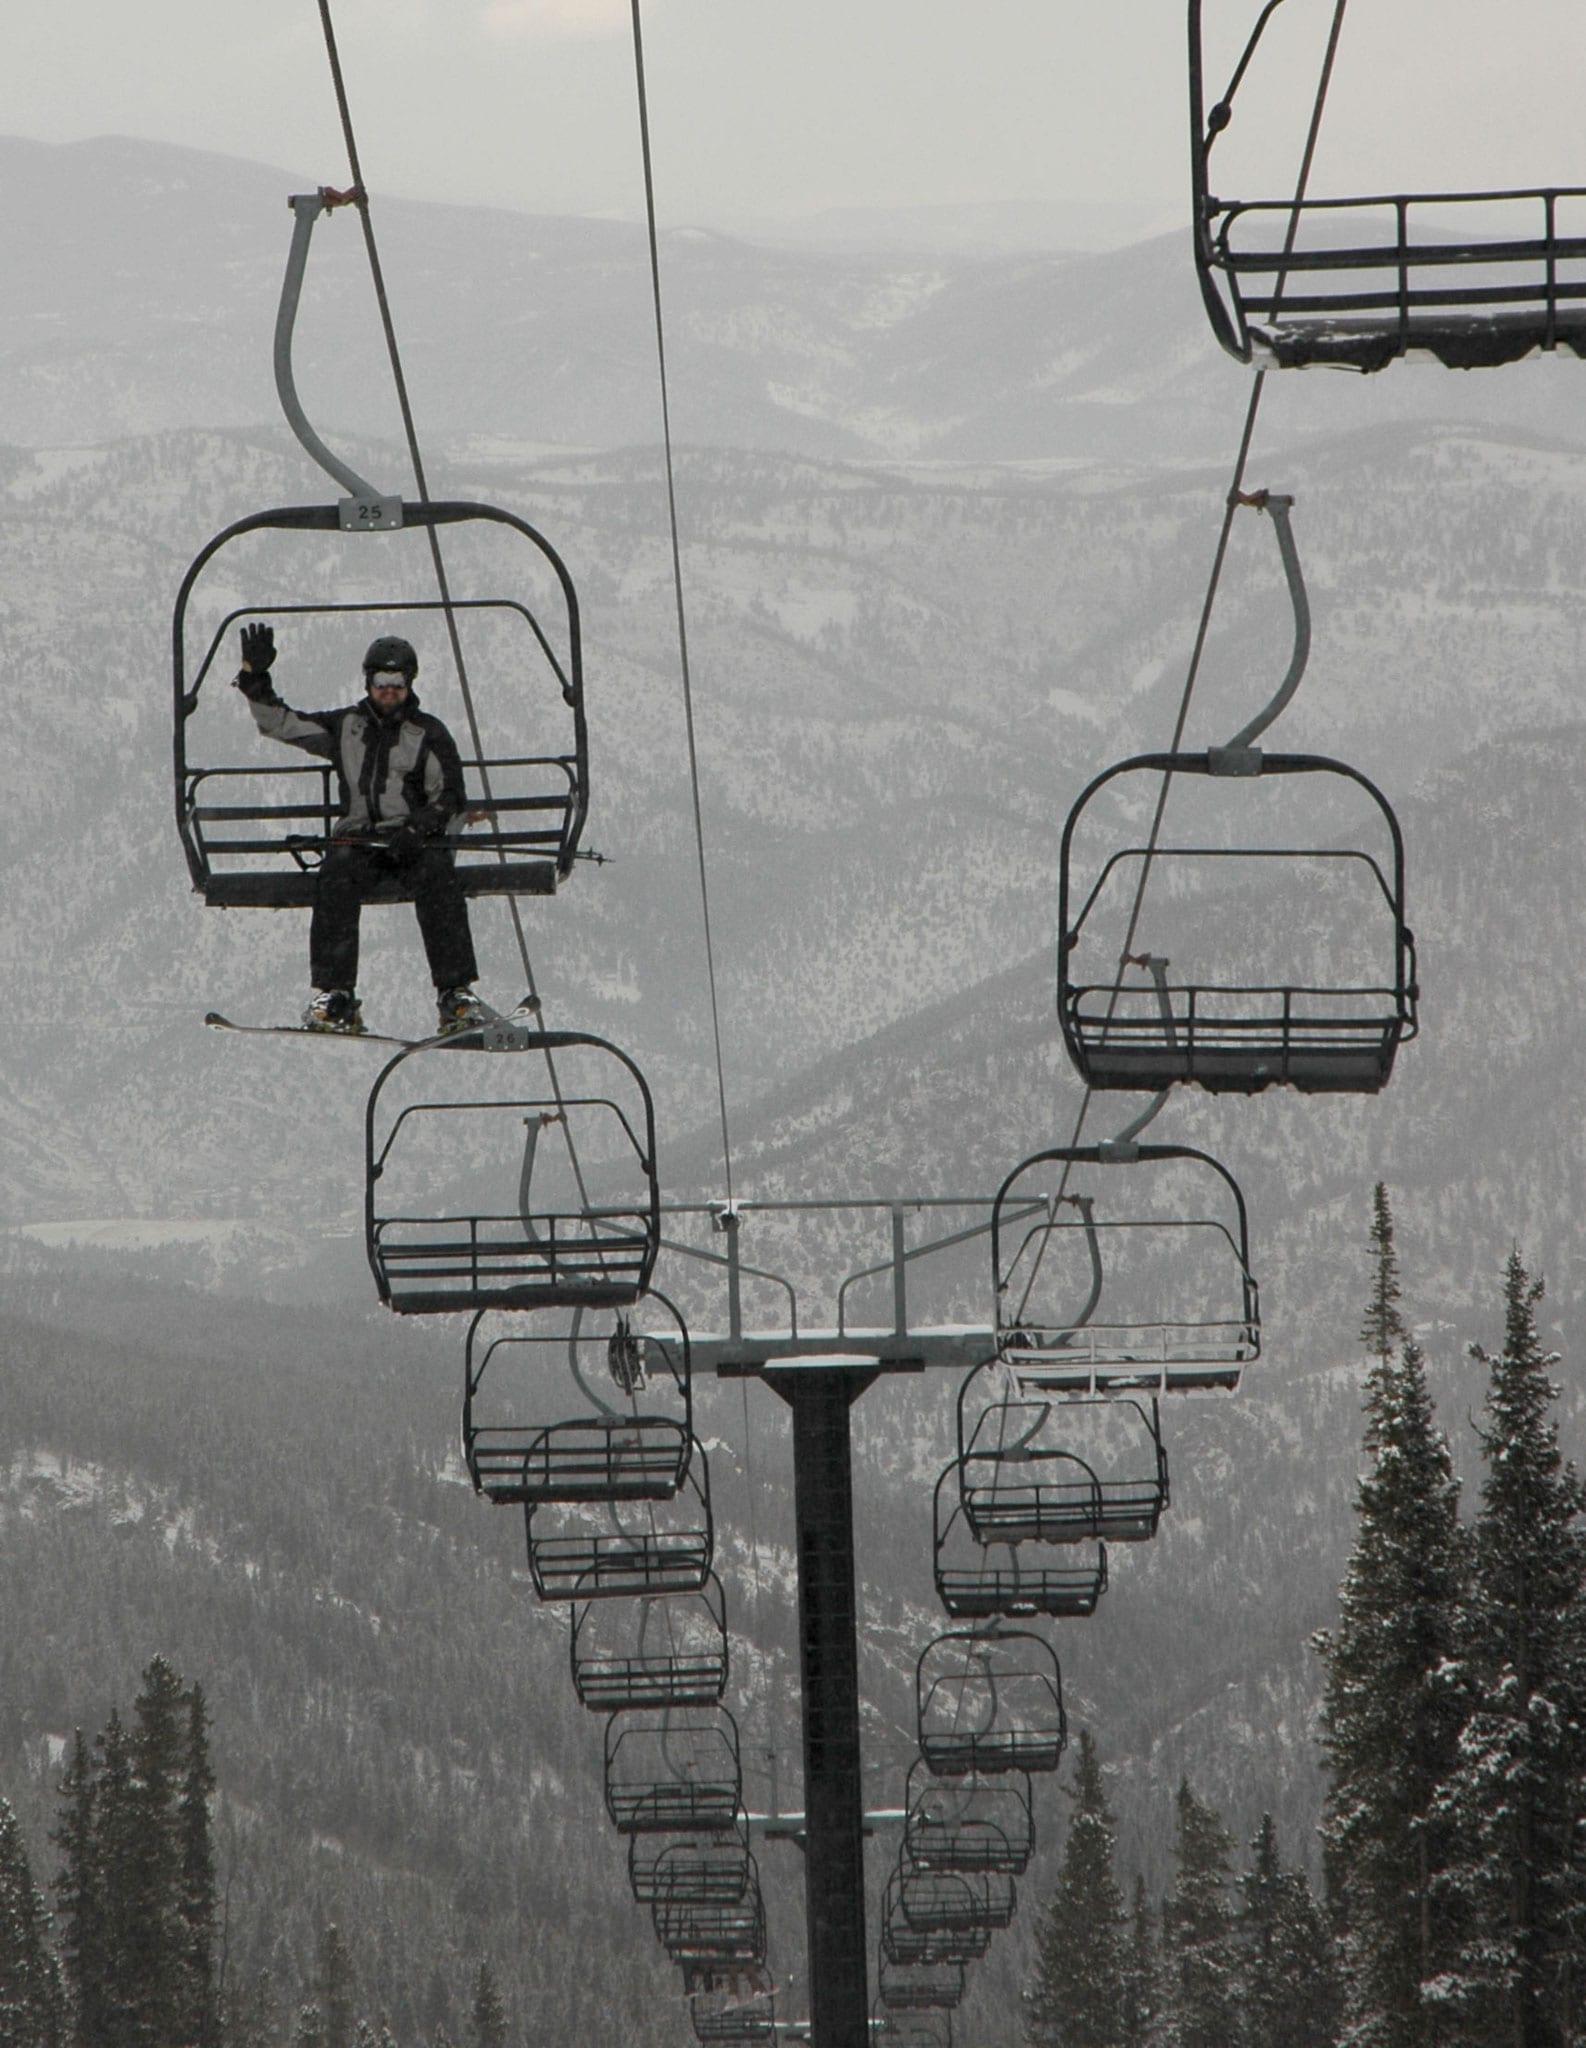 Echo Mountain Resort Chairlift Idaho Springs Colorado